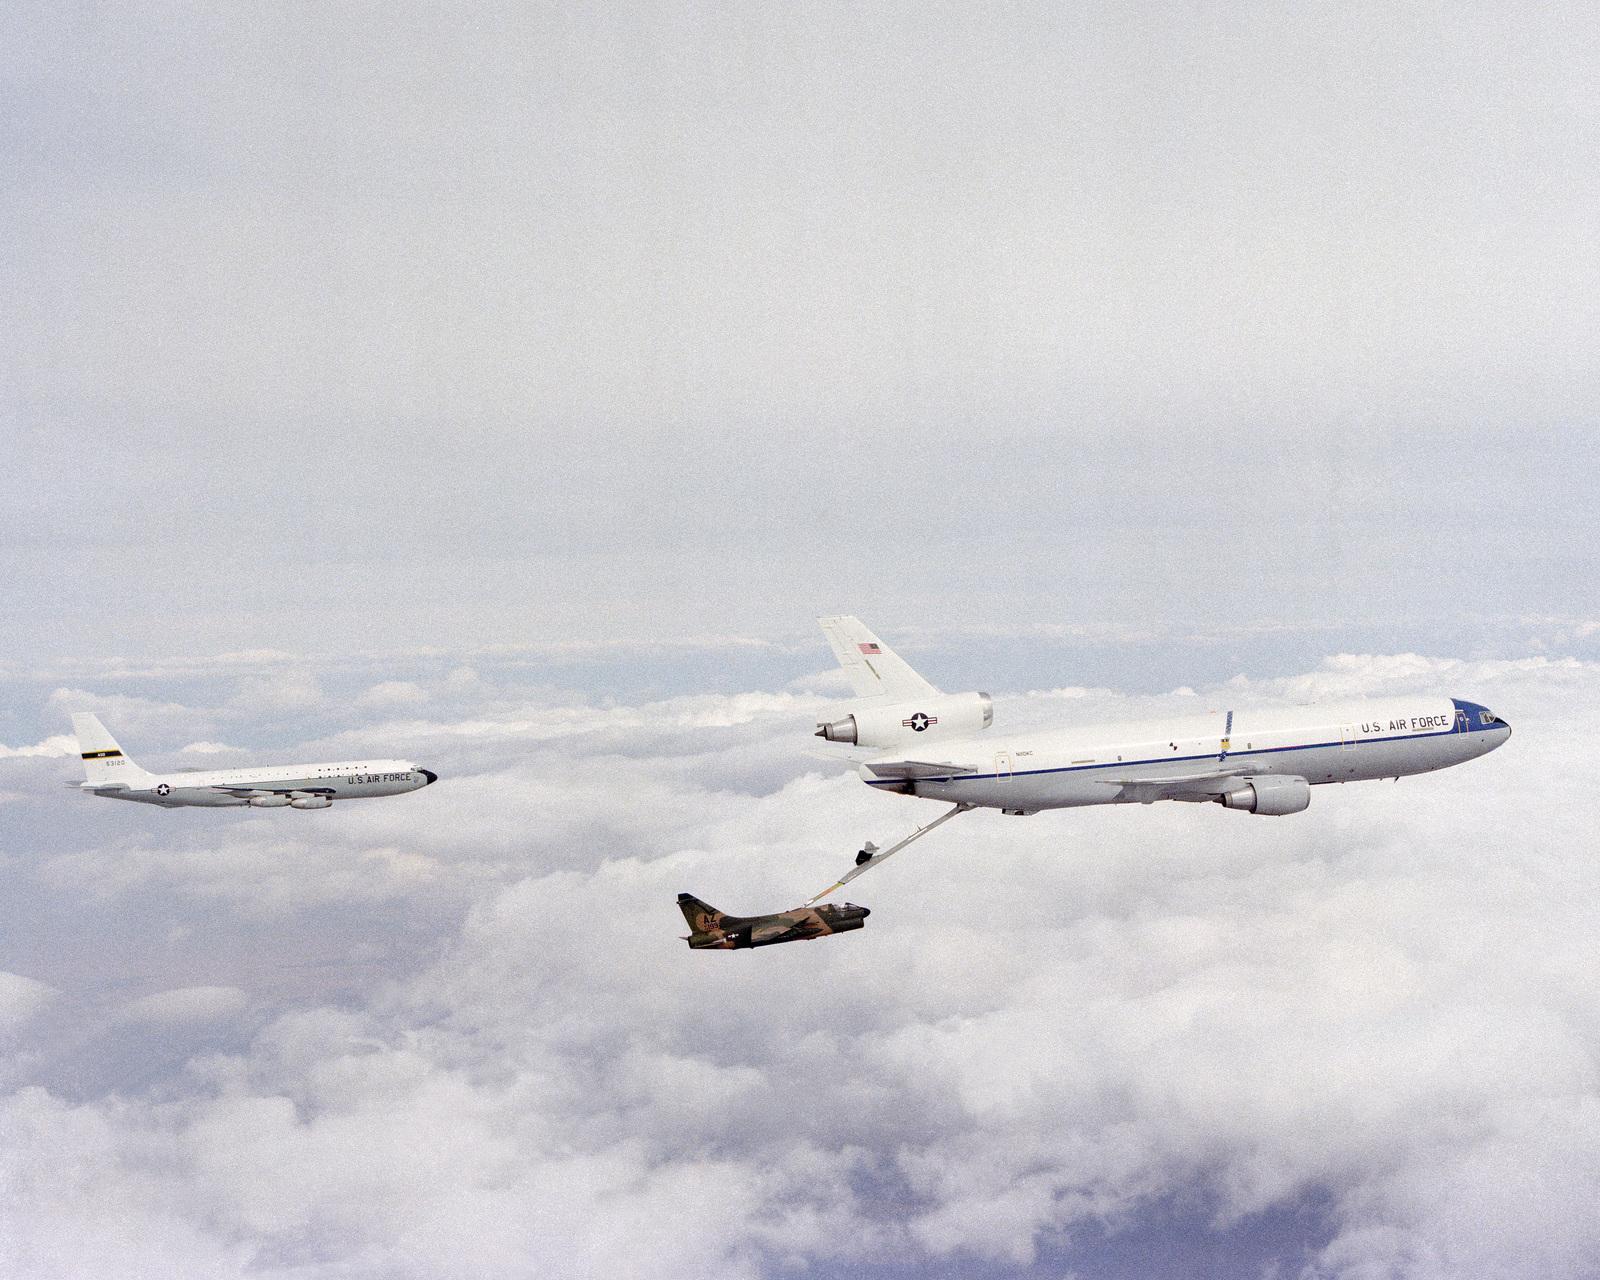 A view of a KC-10A Extender aircraft refueling an A-7D Corsair II aircraft in flight. A KC-135 Stratotanker aircraft is visible behind them